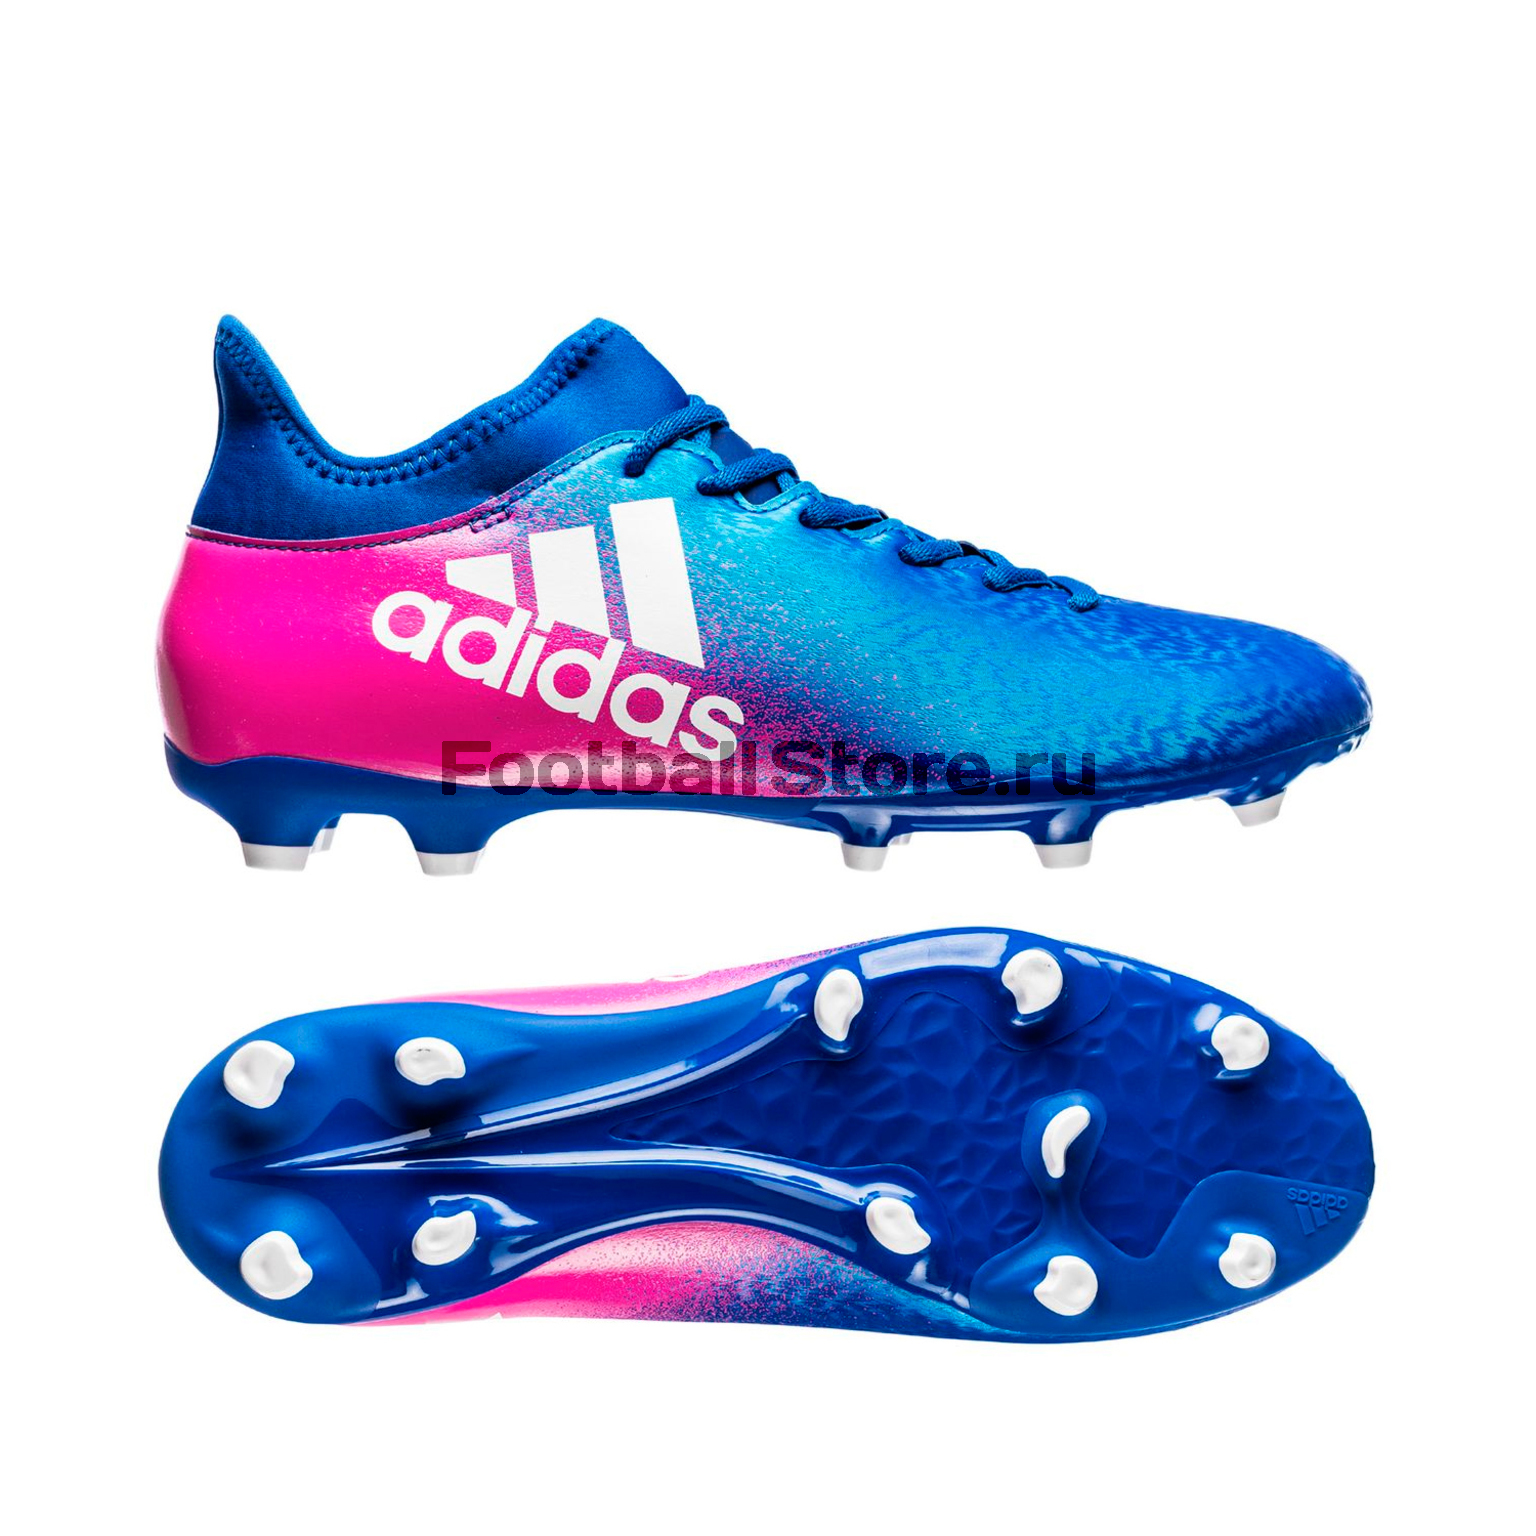 Adidas Бутсы Adidas X 16.3 FG BB5641